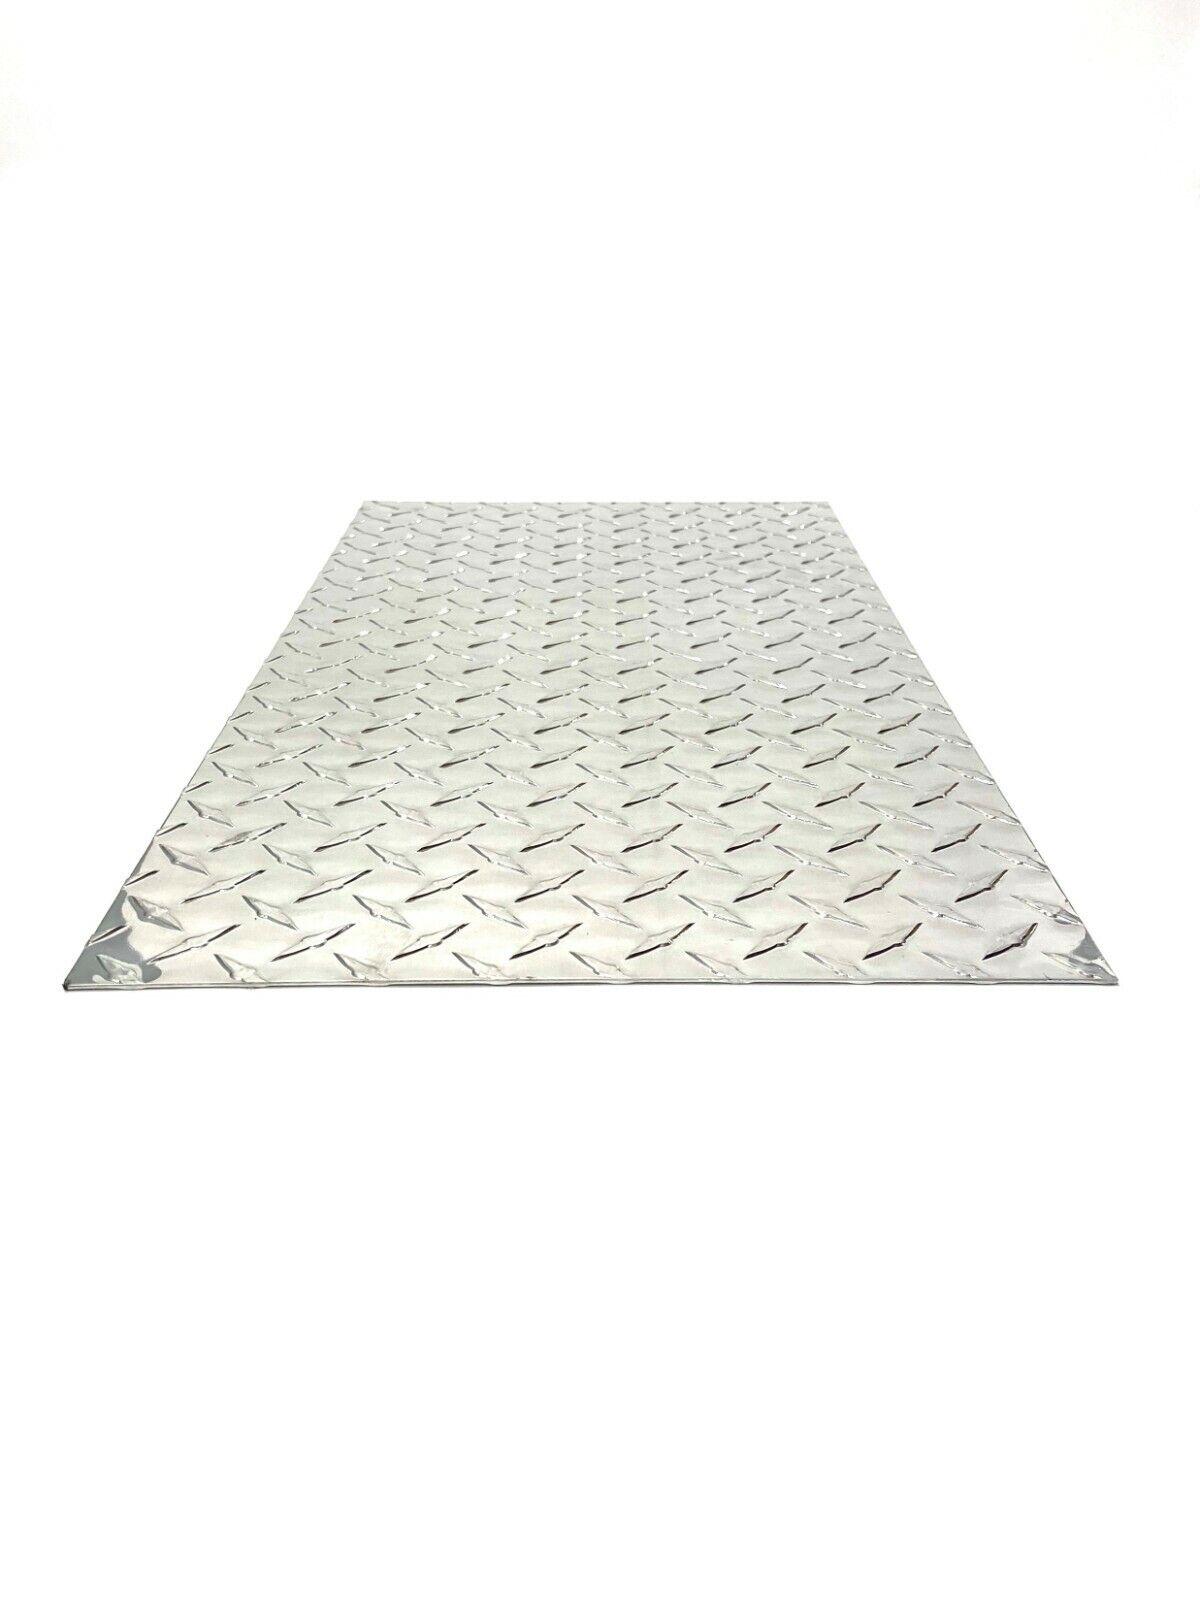 "1//8/"" 3003 Aluminum Diamond Plate Sheet 12.5/"" x 12.5/"""